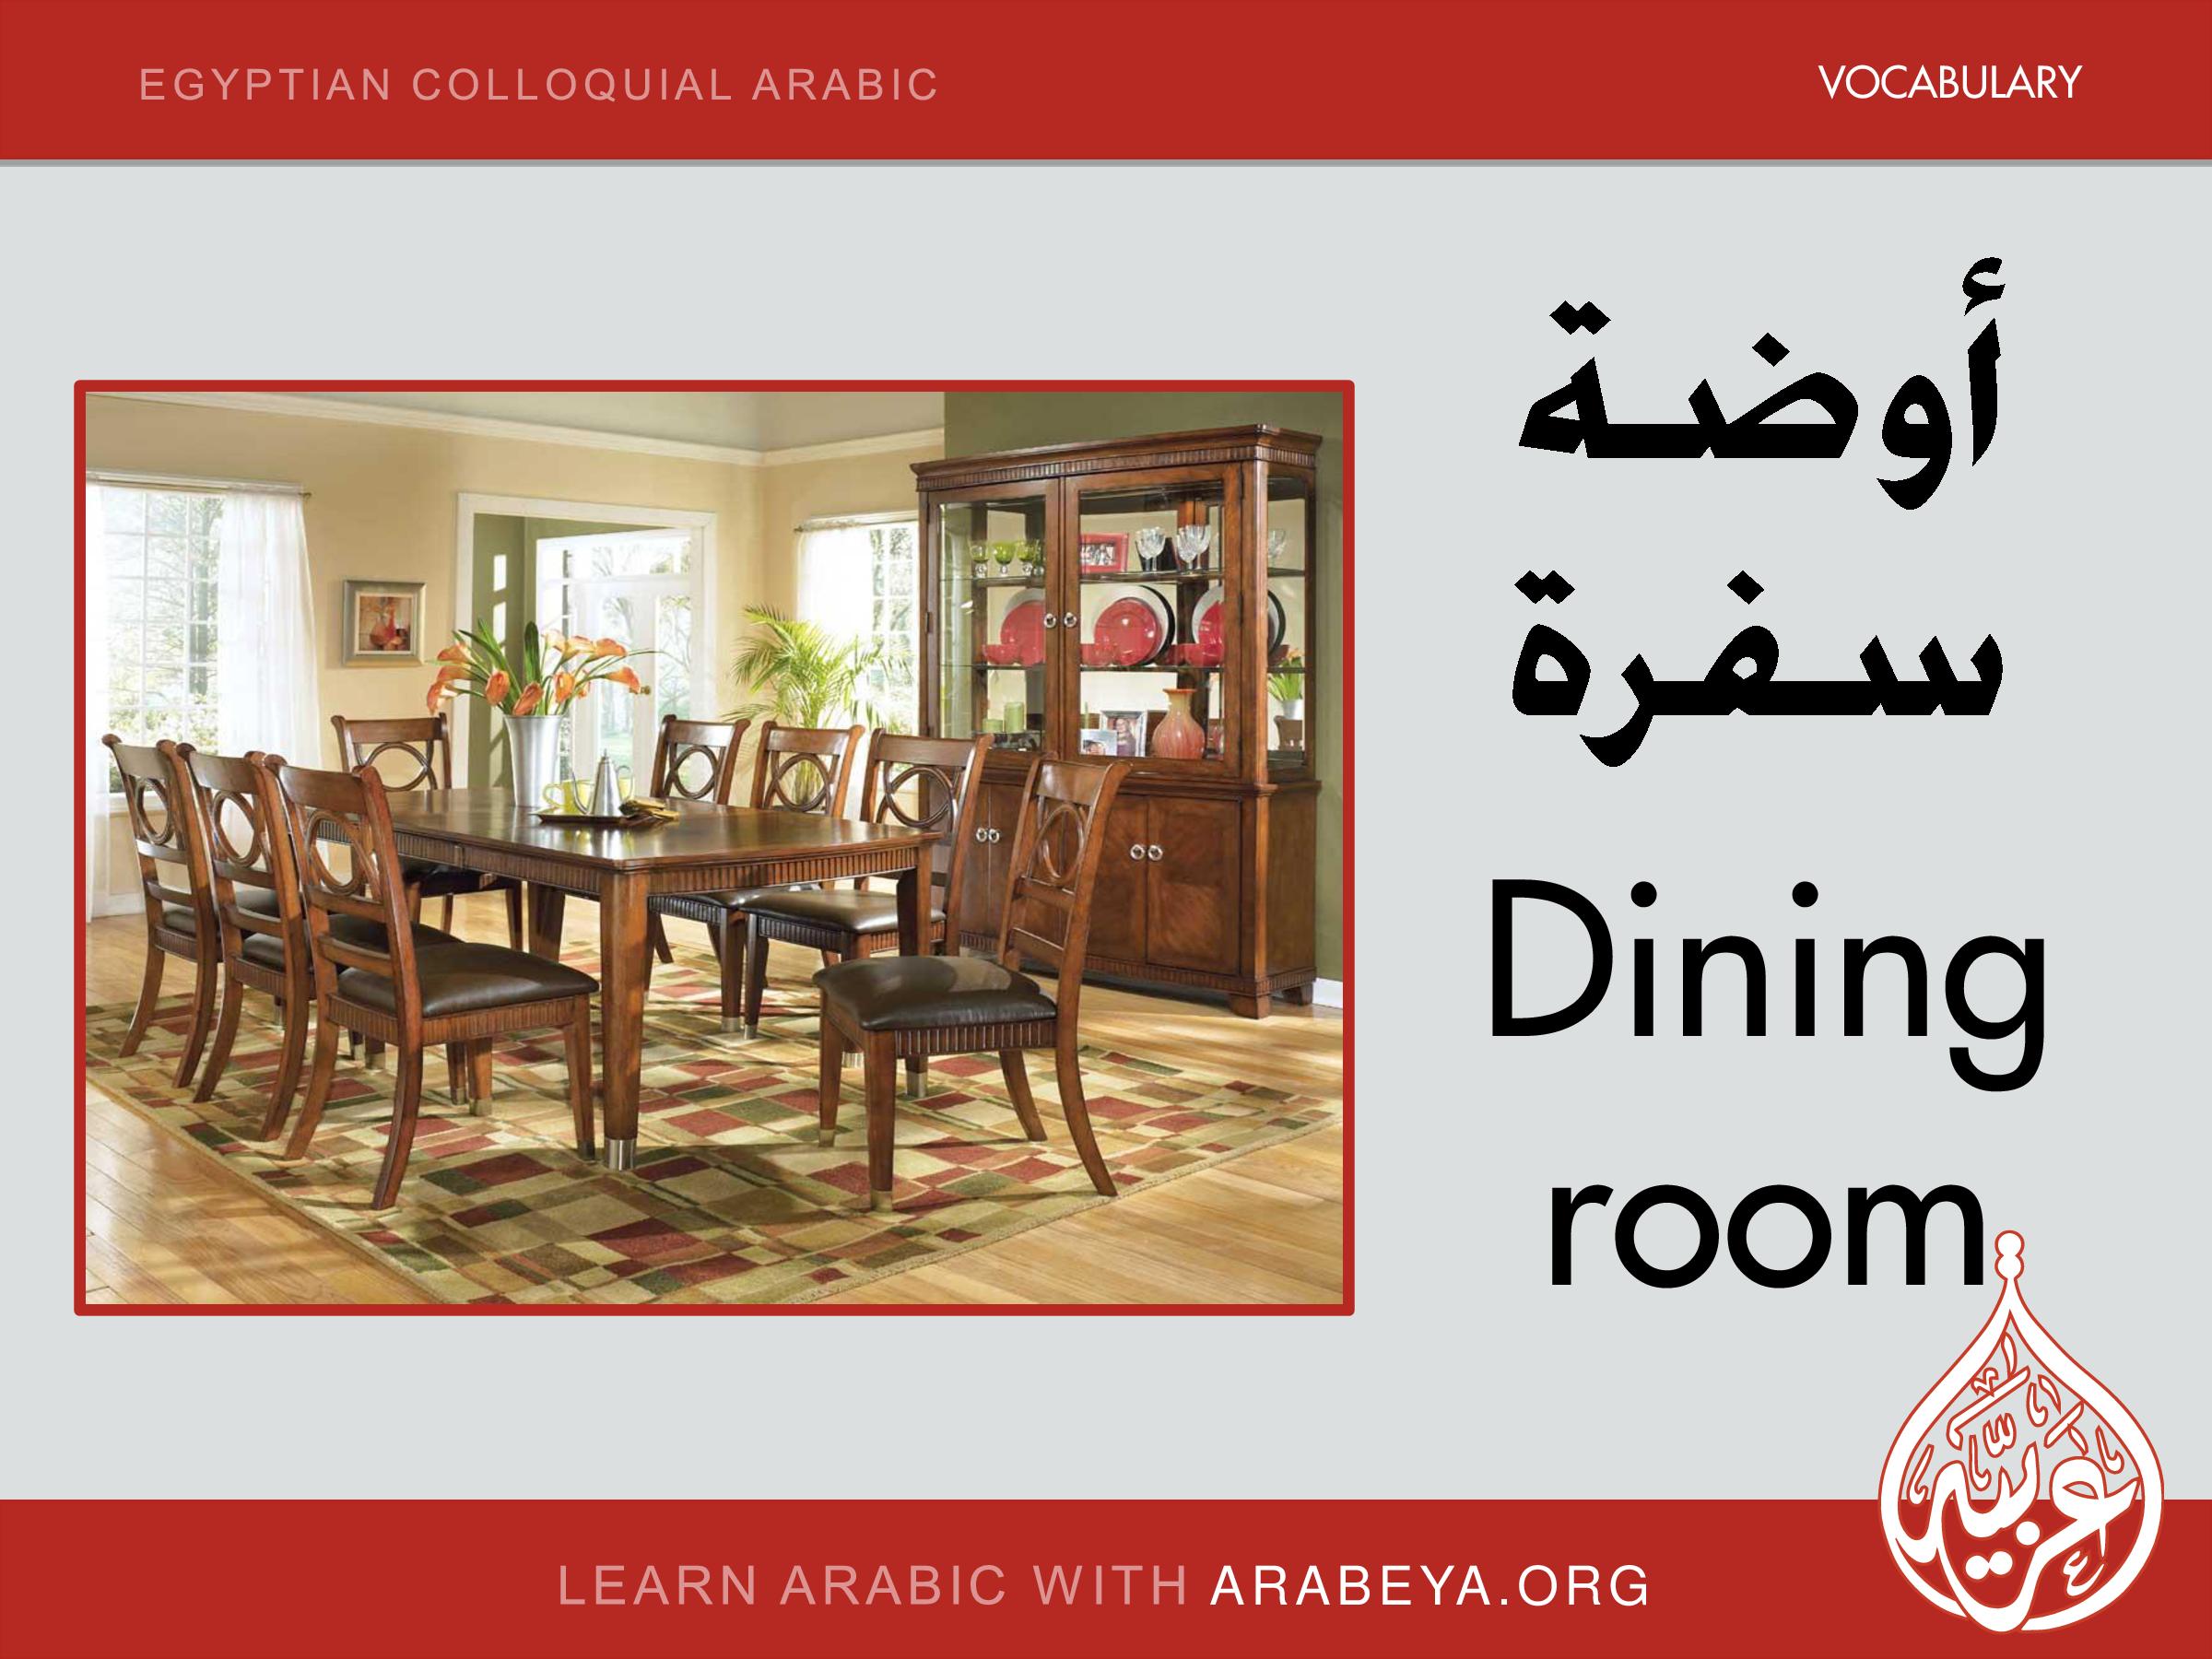 Dining Room Vocabulary The Tennsat Creative